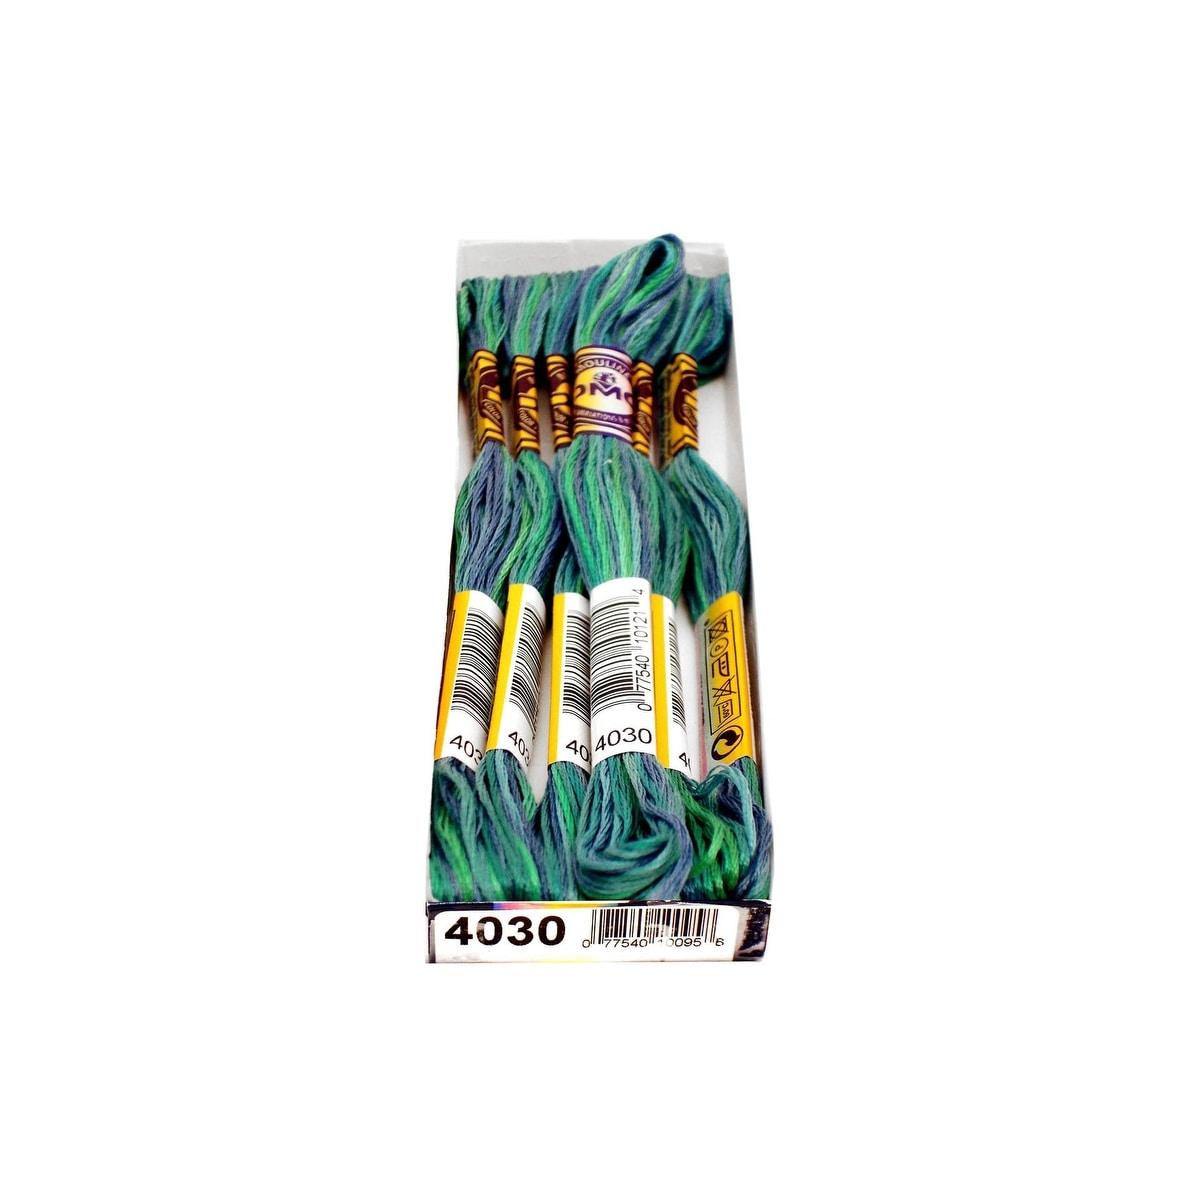 Studio Bungalow Grommet-Top Curtain Panel Light Tarragon Multi 50x84 A21